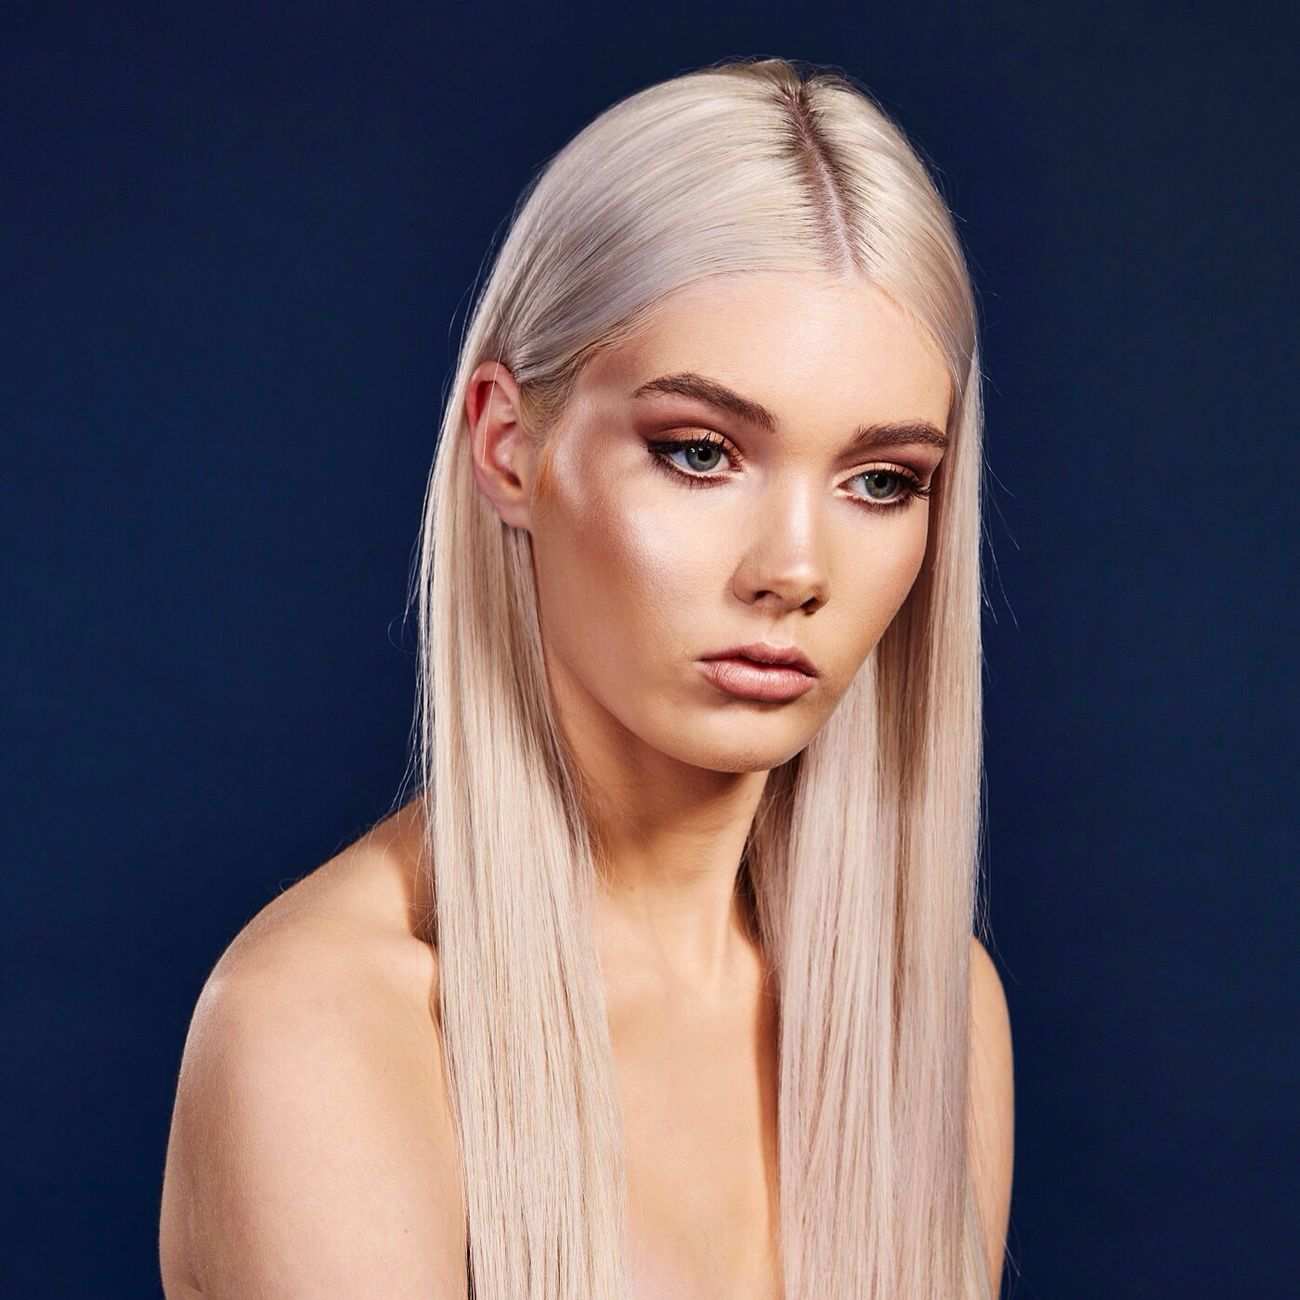 Elise @elisefaust | MUA @jaime.a_makeup | Hair @visionsofhair_revesby Beauty Sydney, Australia Australia Studio Nicgossage.com